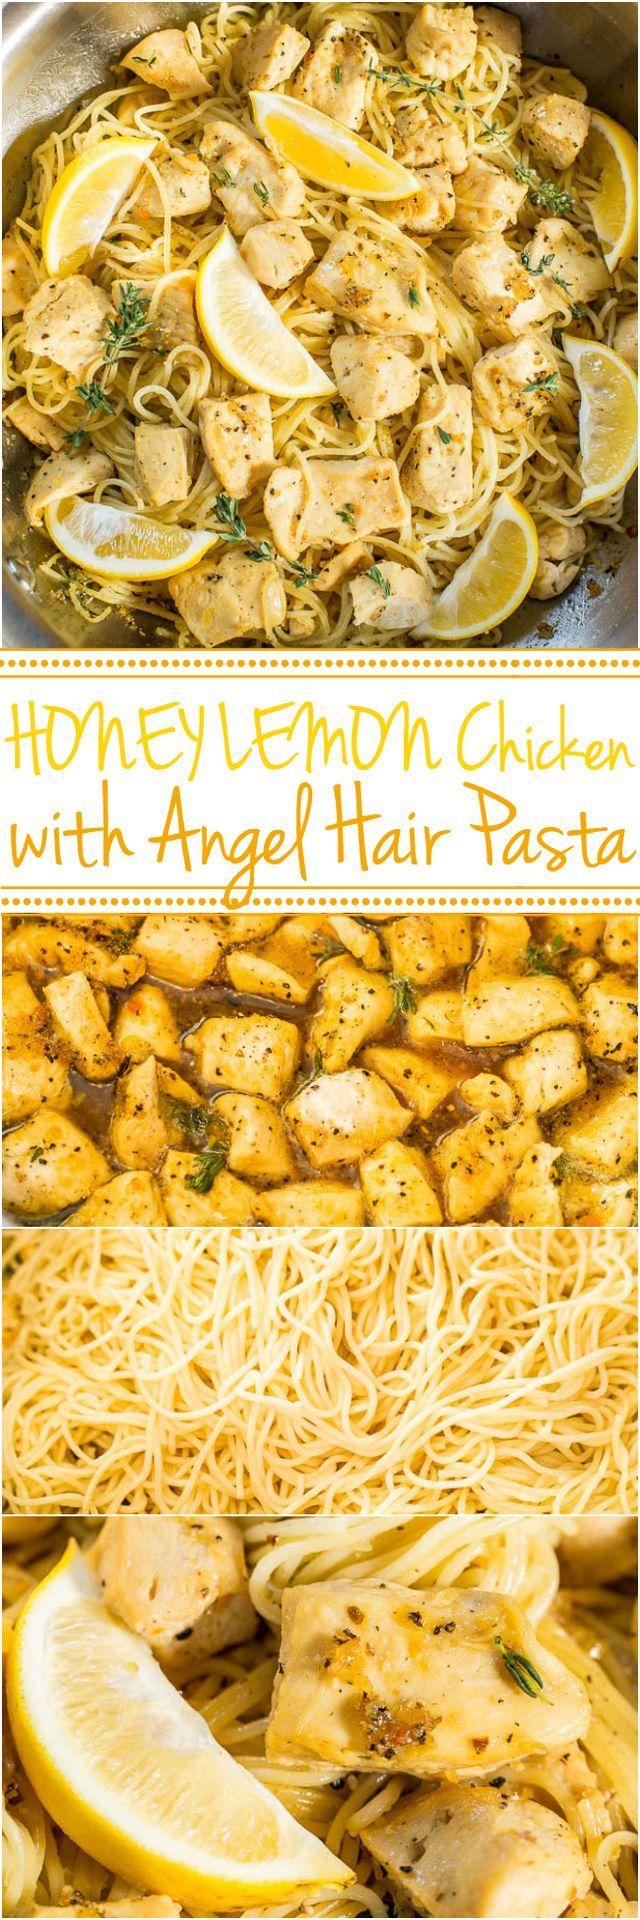 Honey Lemon Chicken with Angel Hair Pasta (via Bloglovin.com )